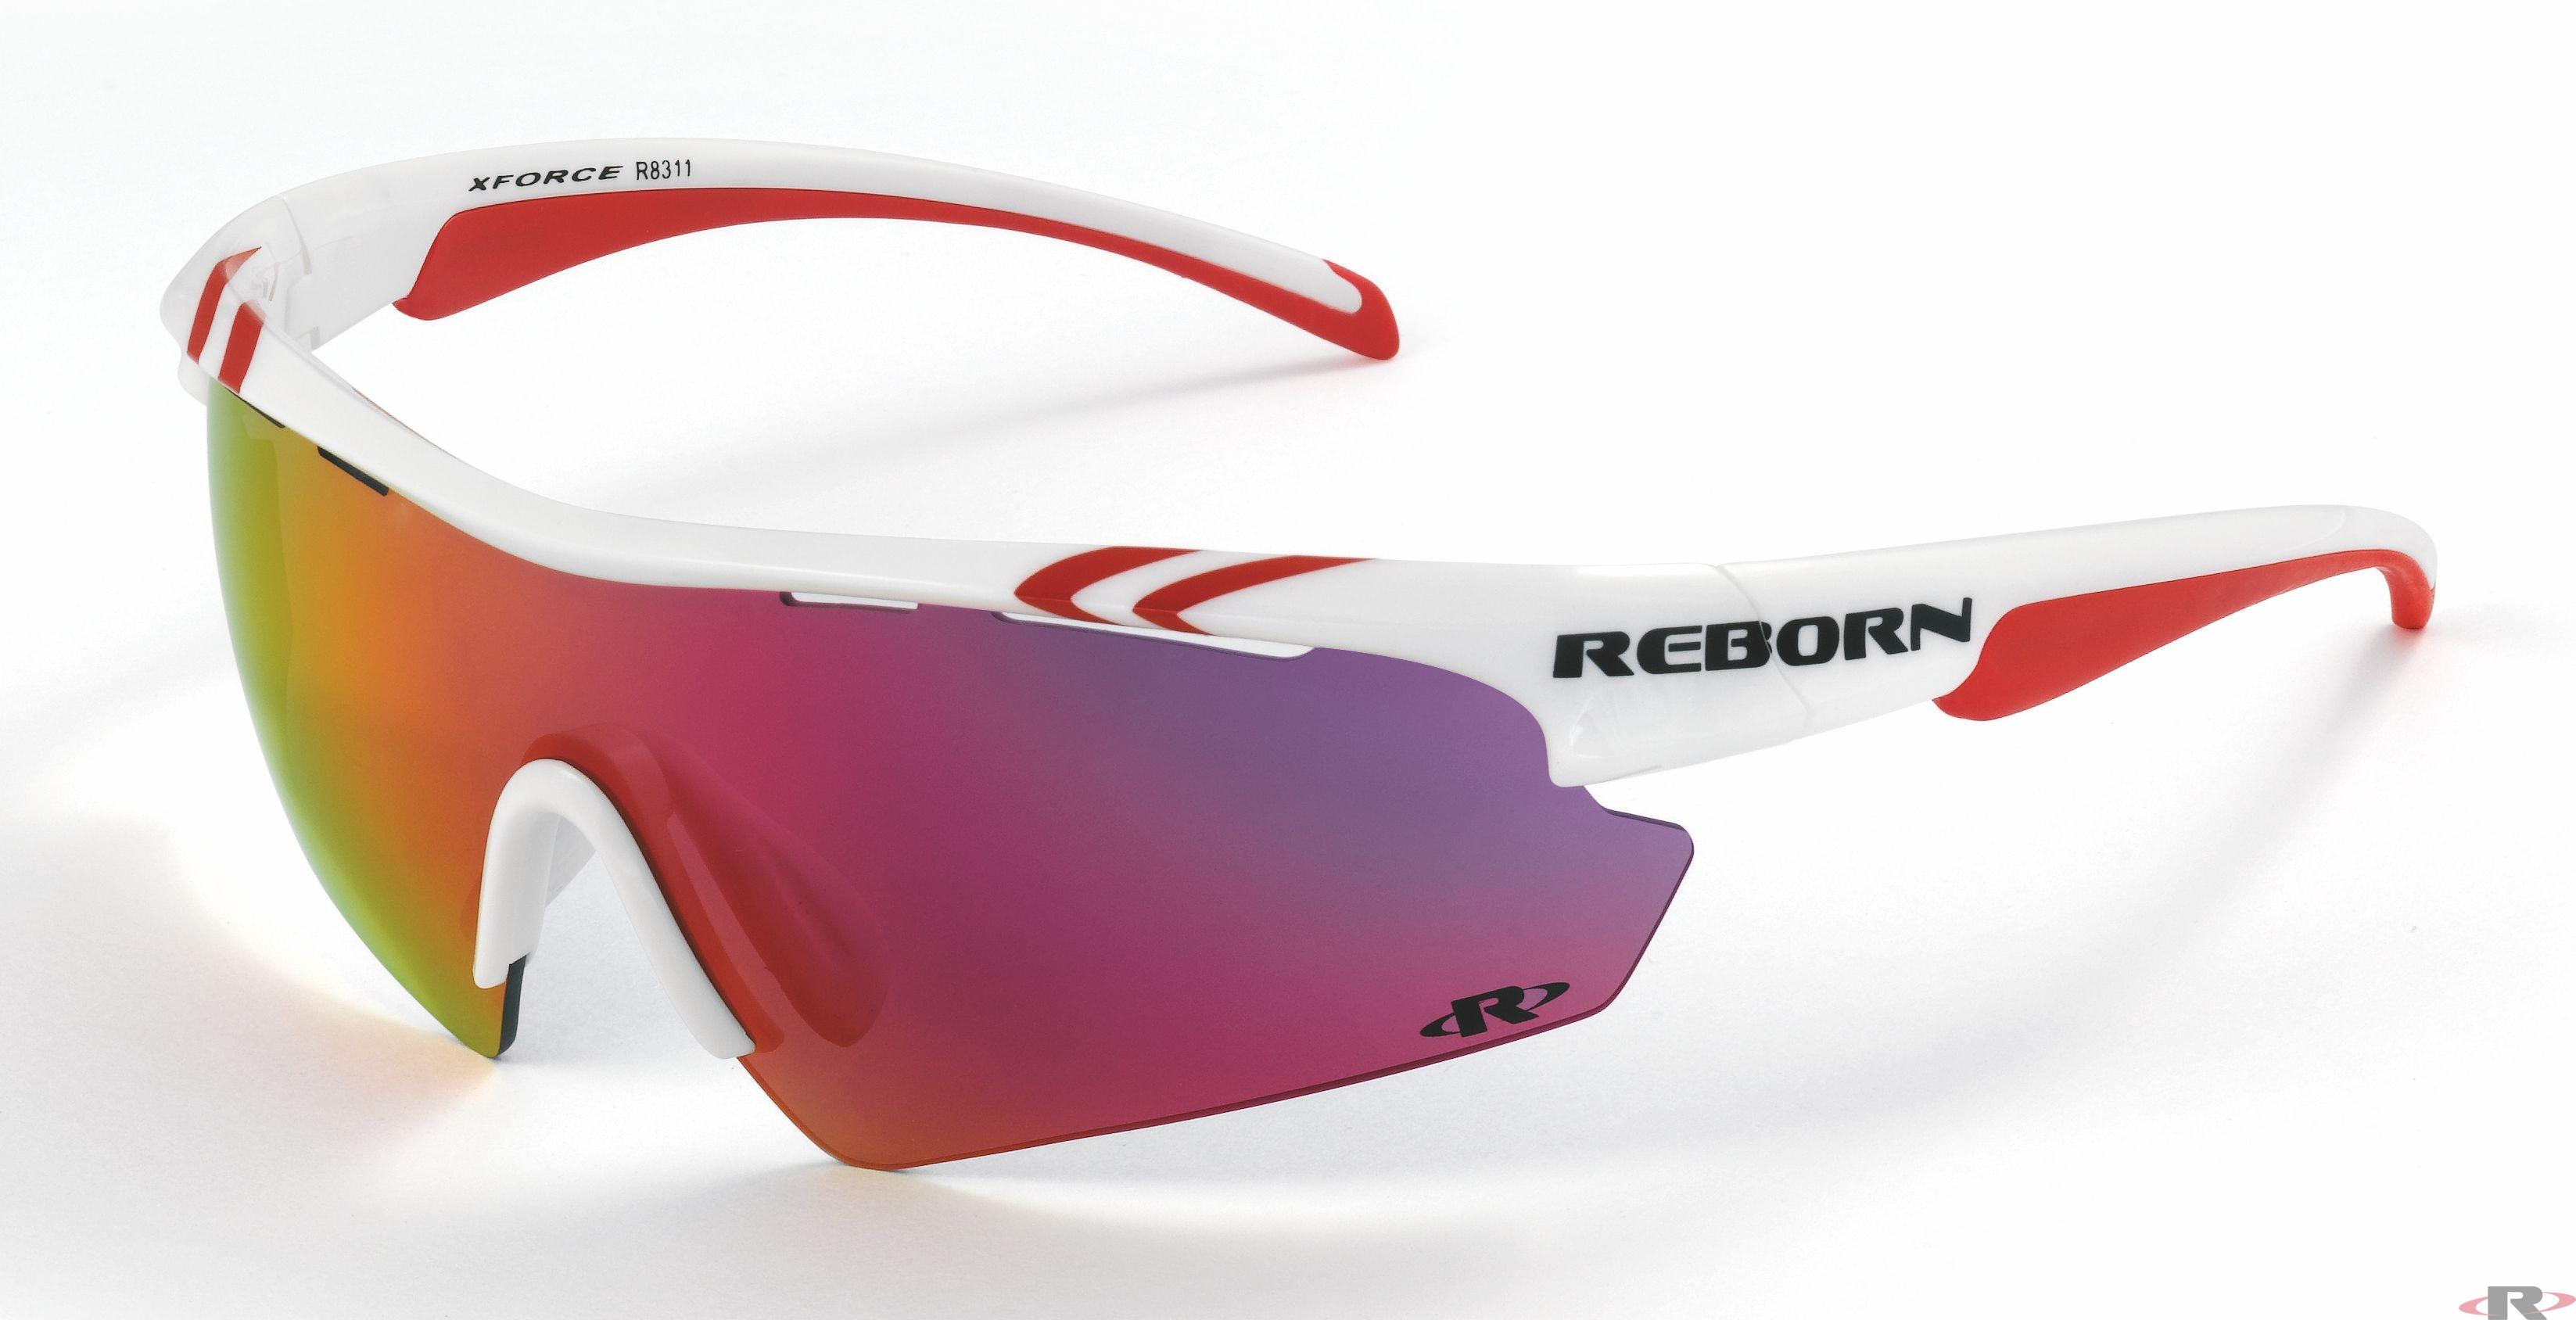 X-PRO weiss-rot / revo red